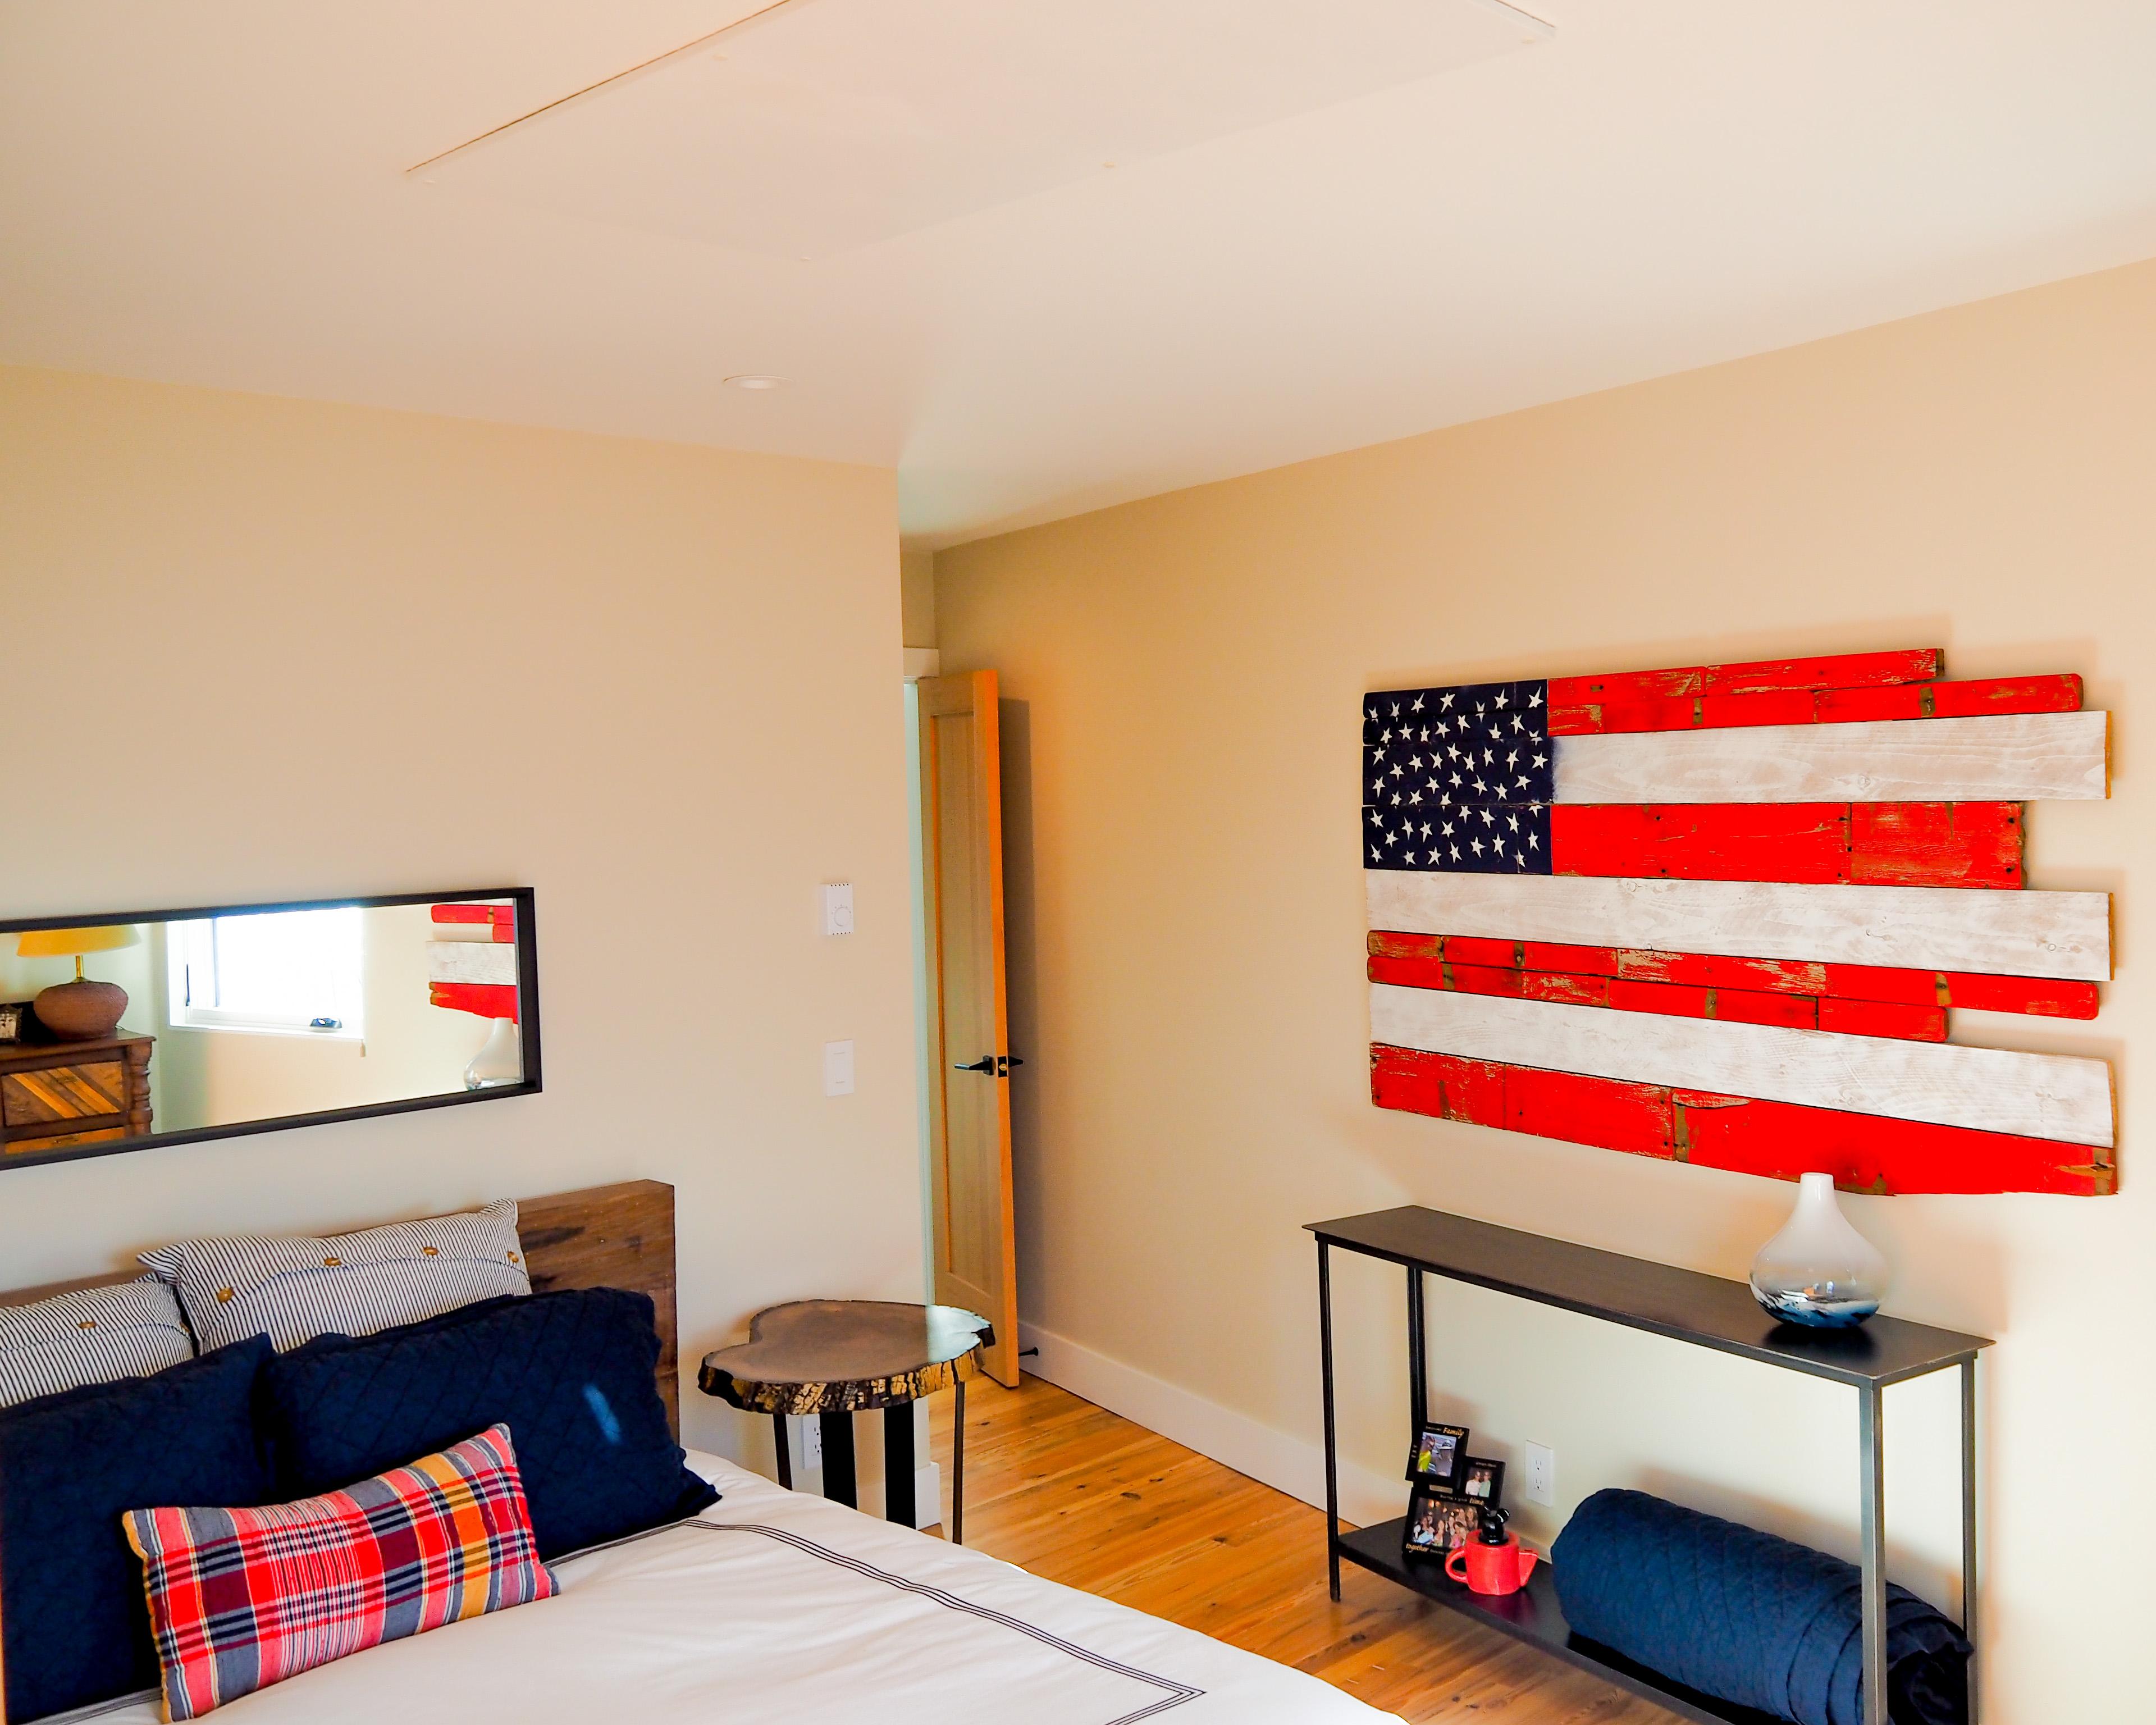 Ducoterra SolaRay Far Infrared Panel in a Bedroom